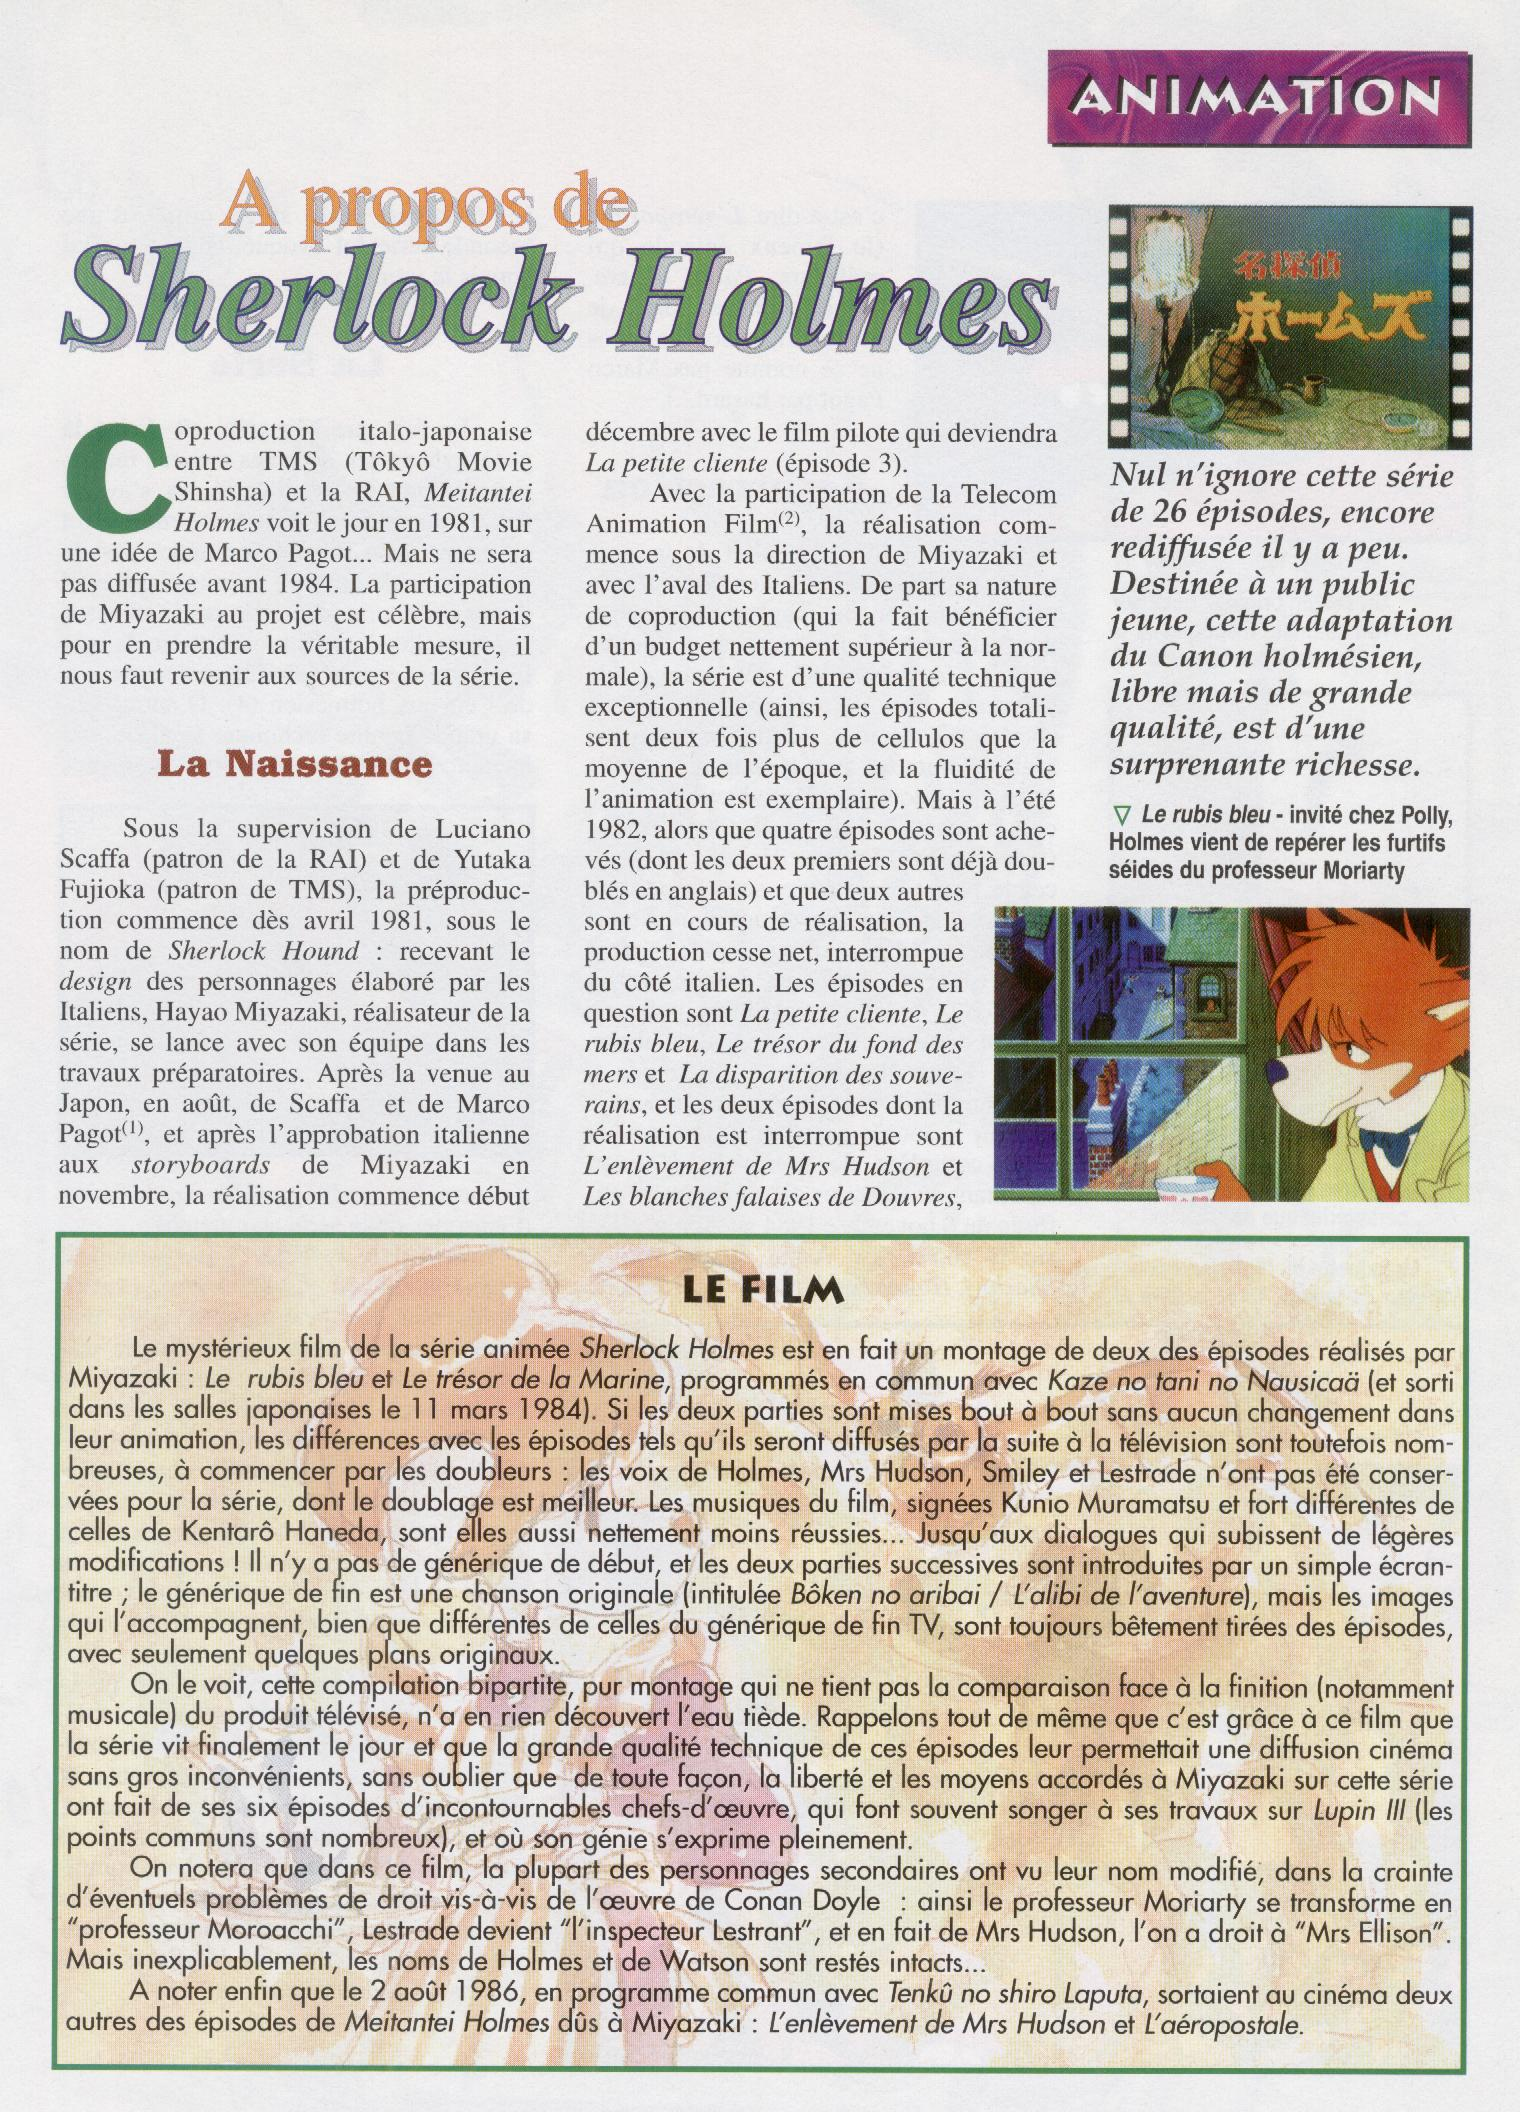 http://grenierdelatv.free.fr/sherlockholmesal26oct199601.jpg